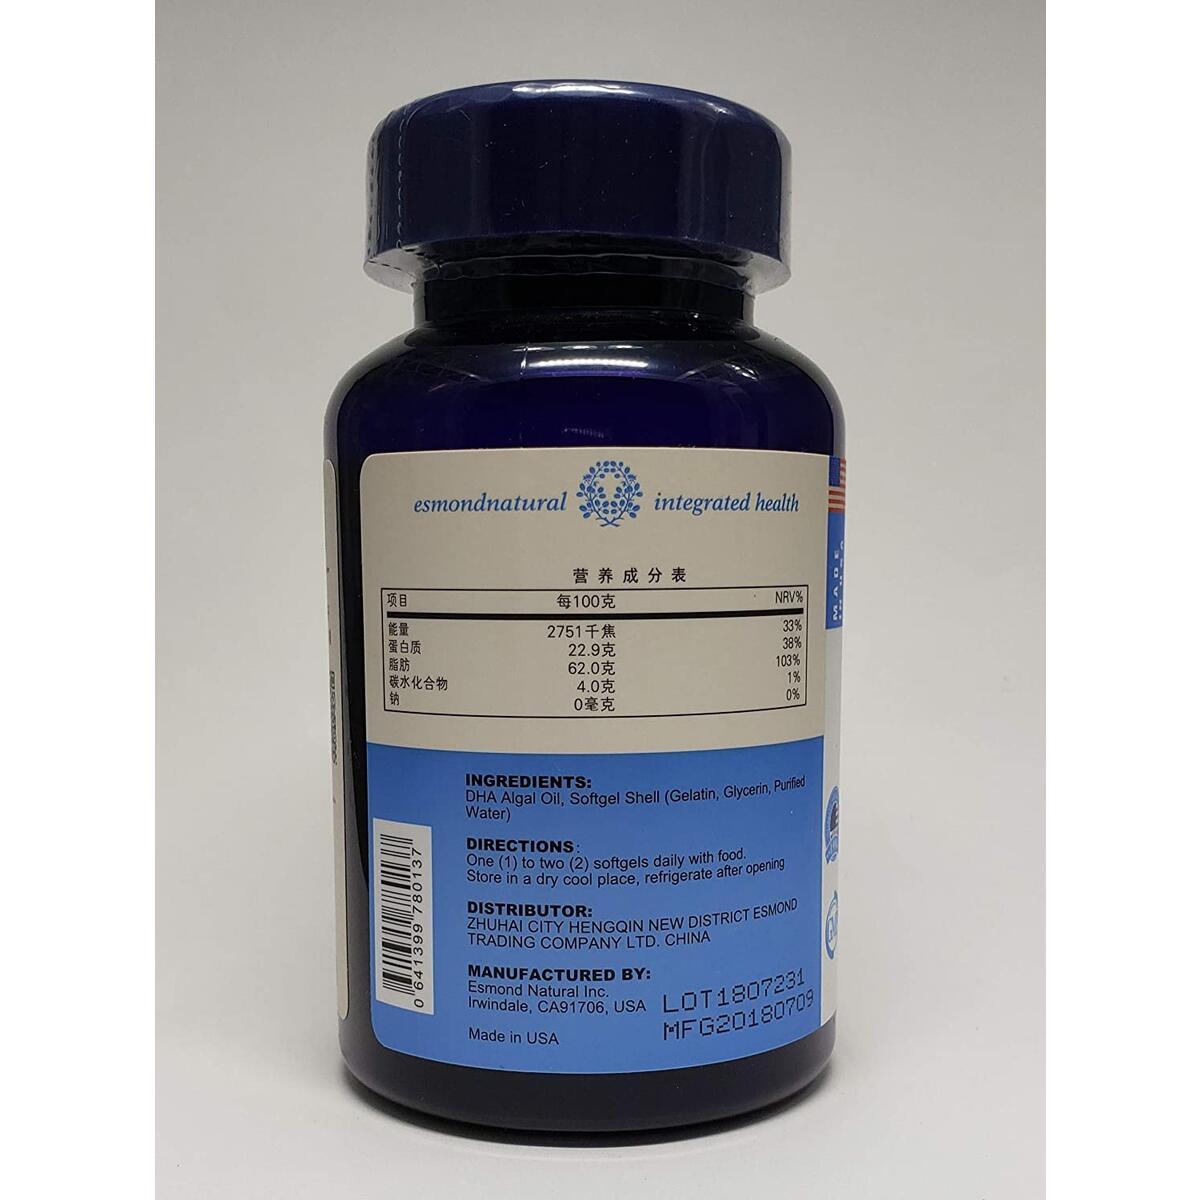 Esmond Natural: DHA Algal Oil (40% DHA Docosahexaenoic Acid), GMP, Natural Product Assn Certified, Made in USA-480mg, 60 Softgels